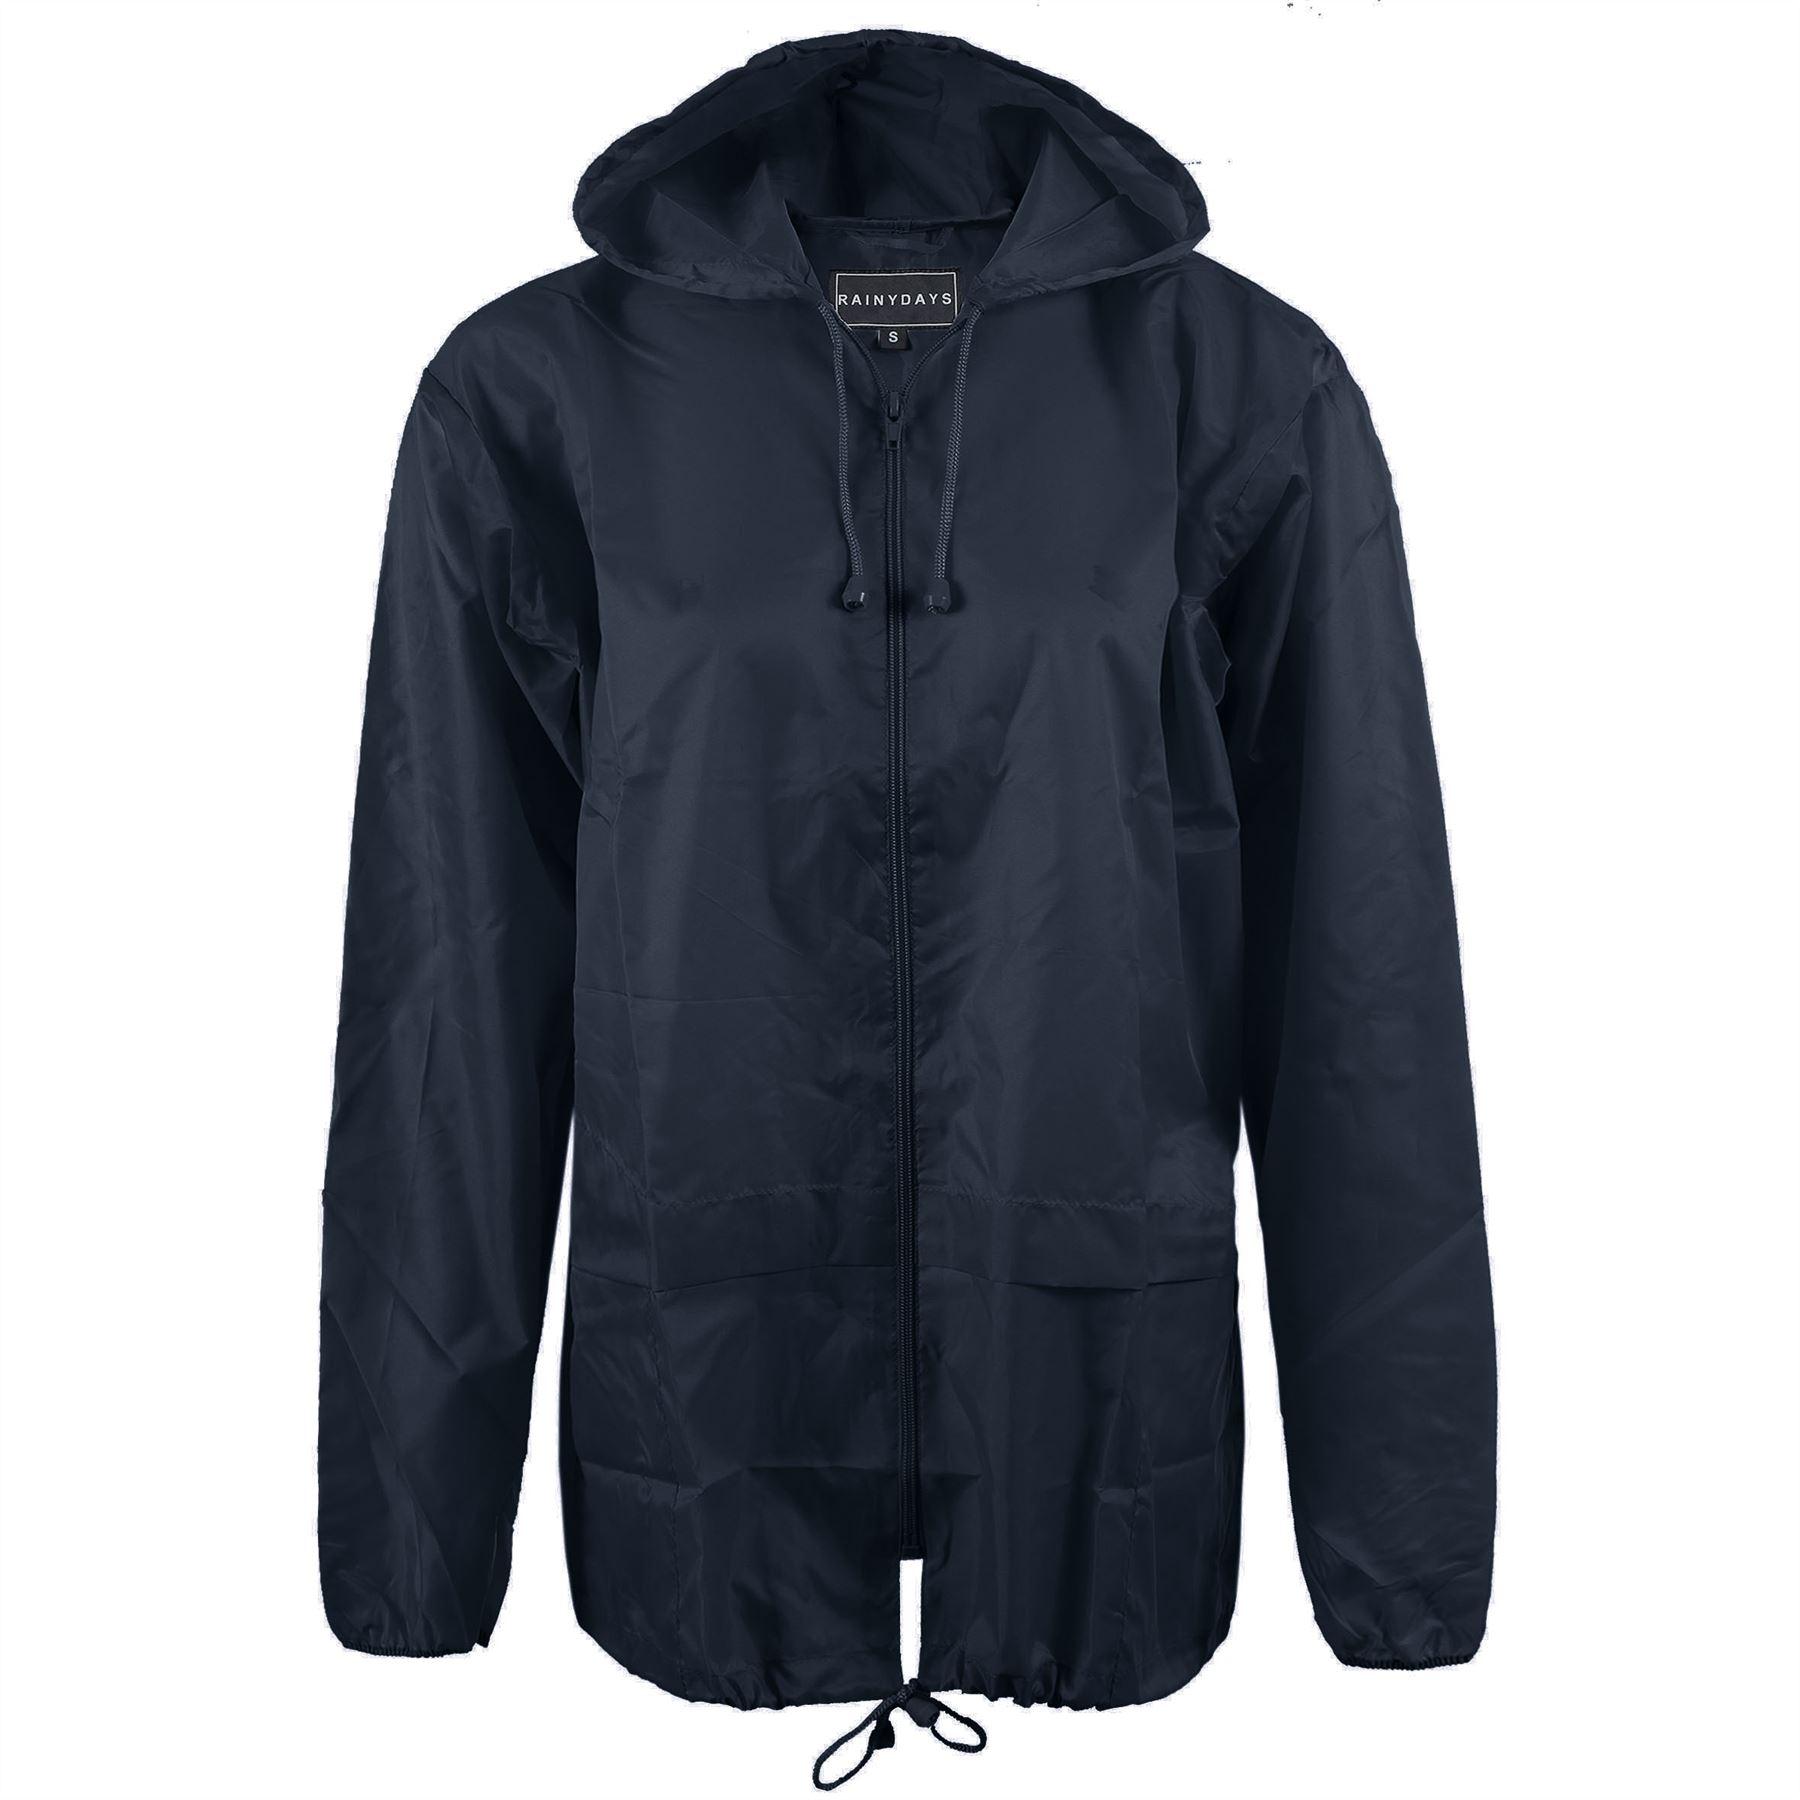 hooded raincoats for women - photo #22